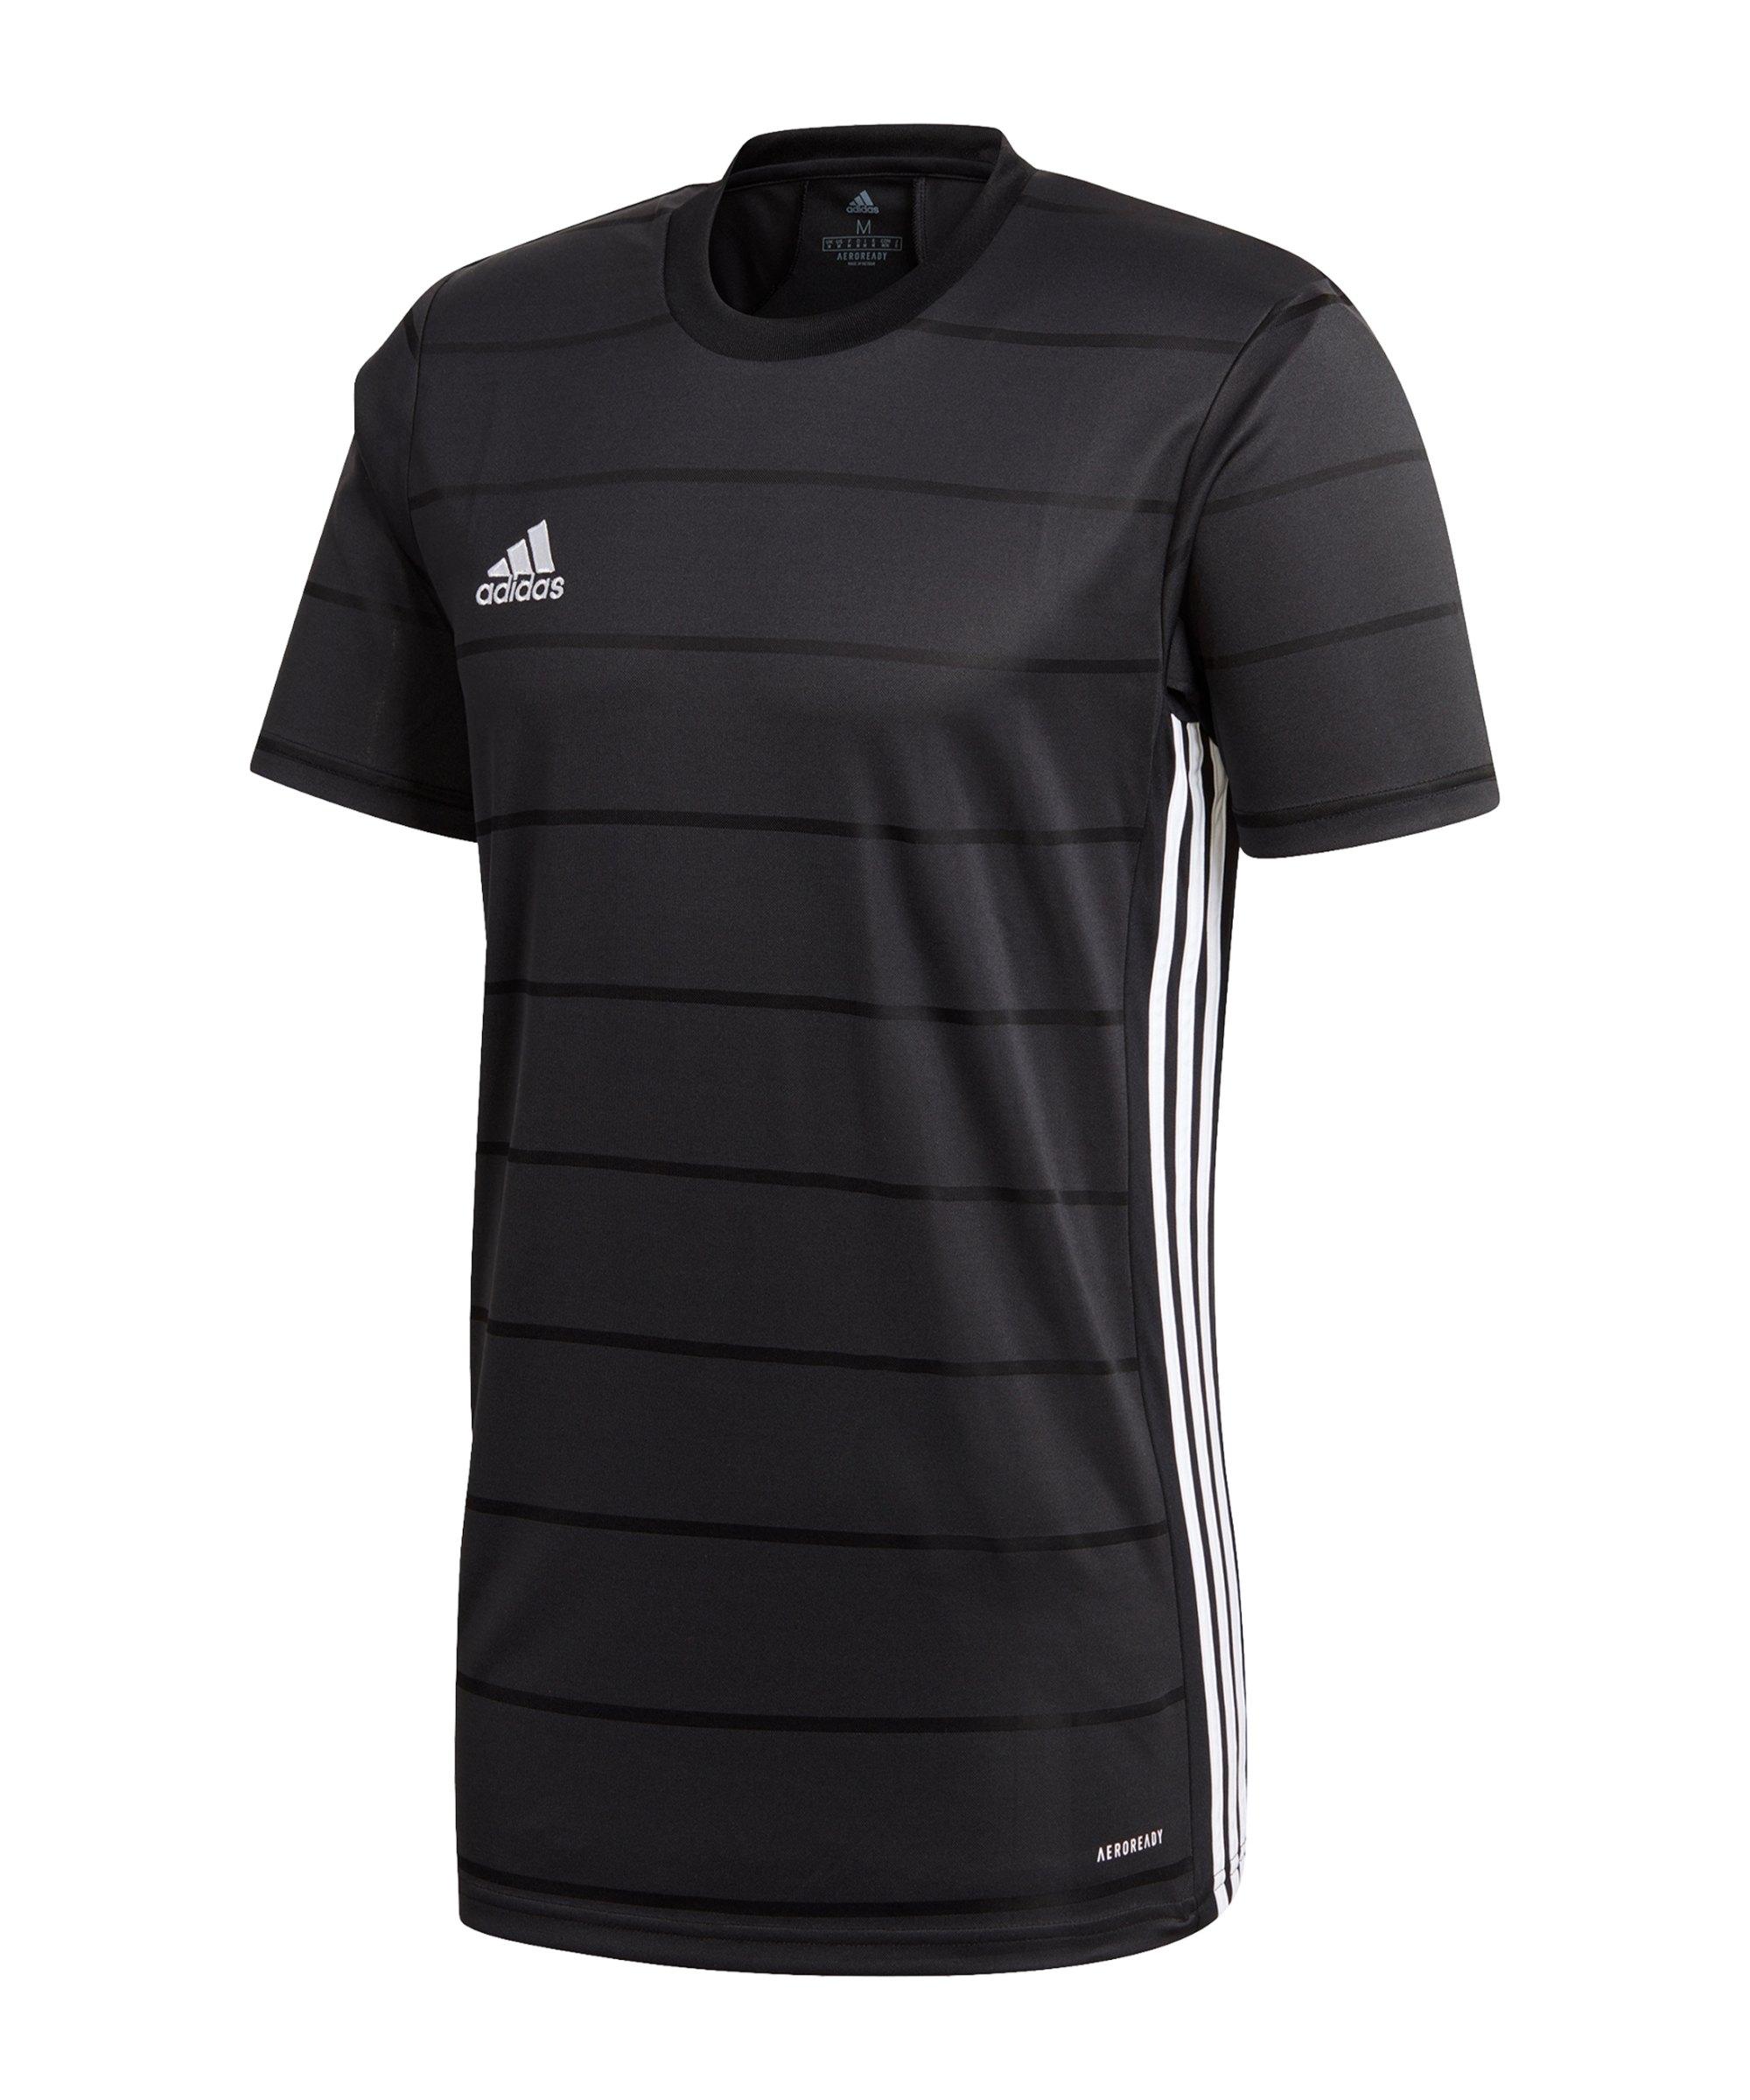 adidas Campeon 21 Trikot kurzarm Kids Schwarz - schwarz